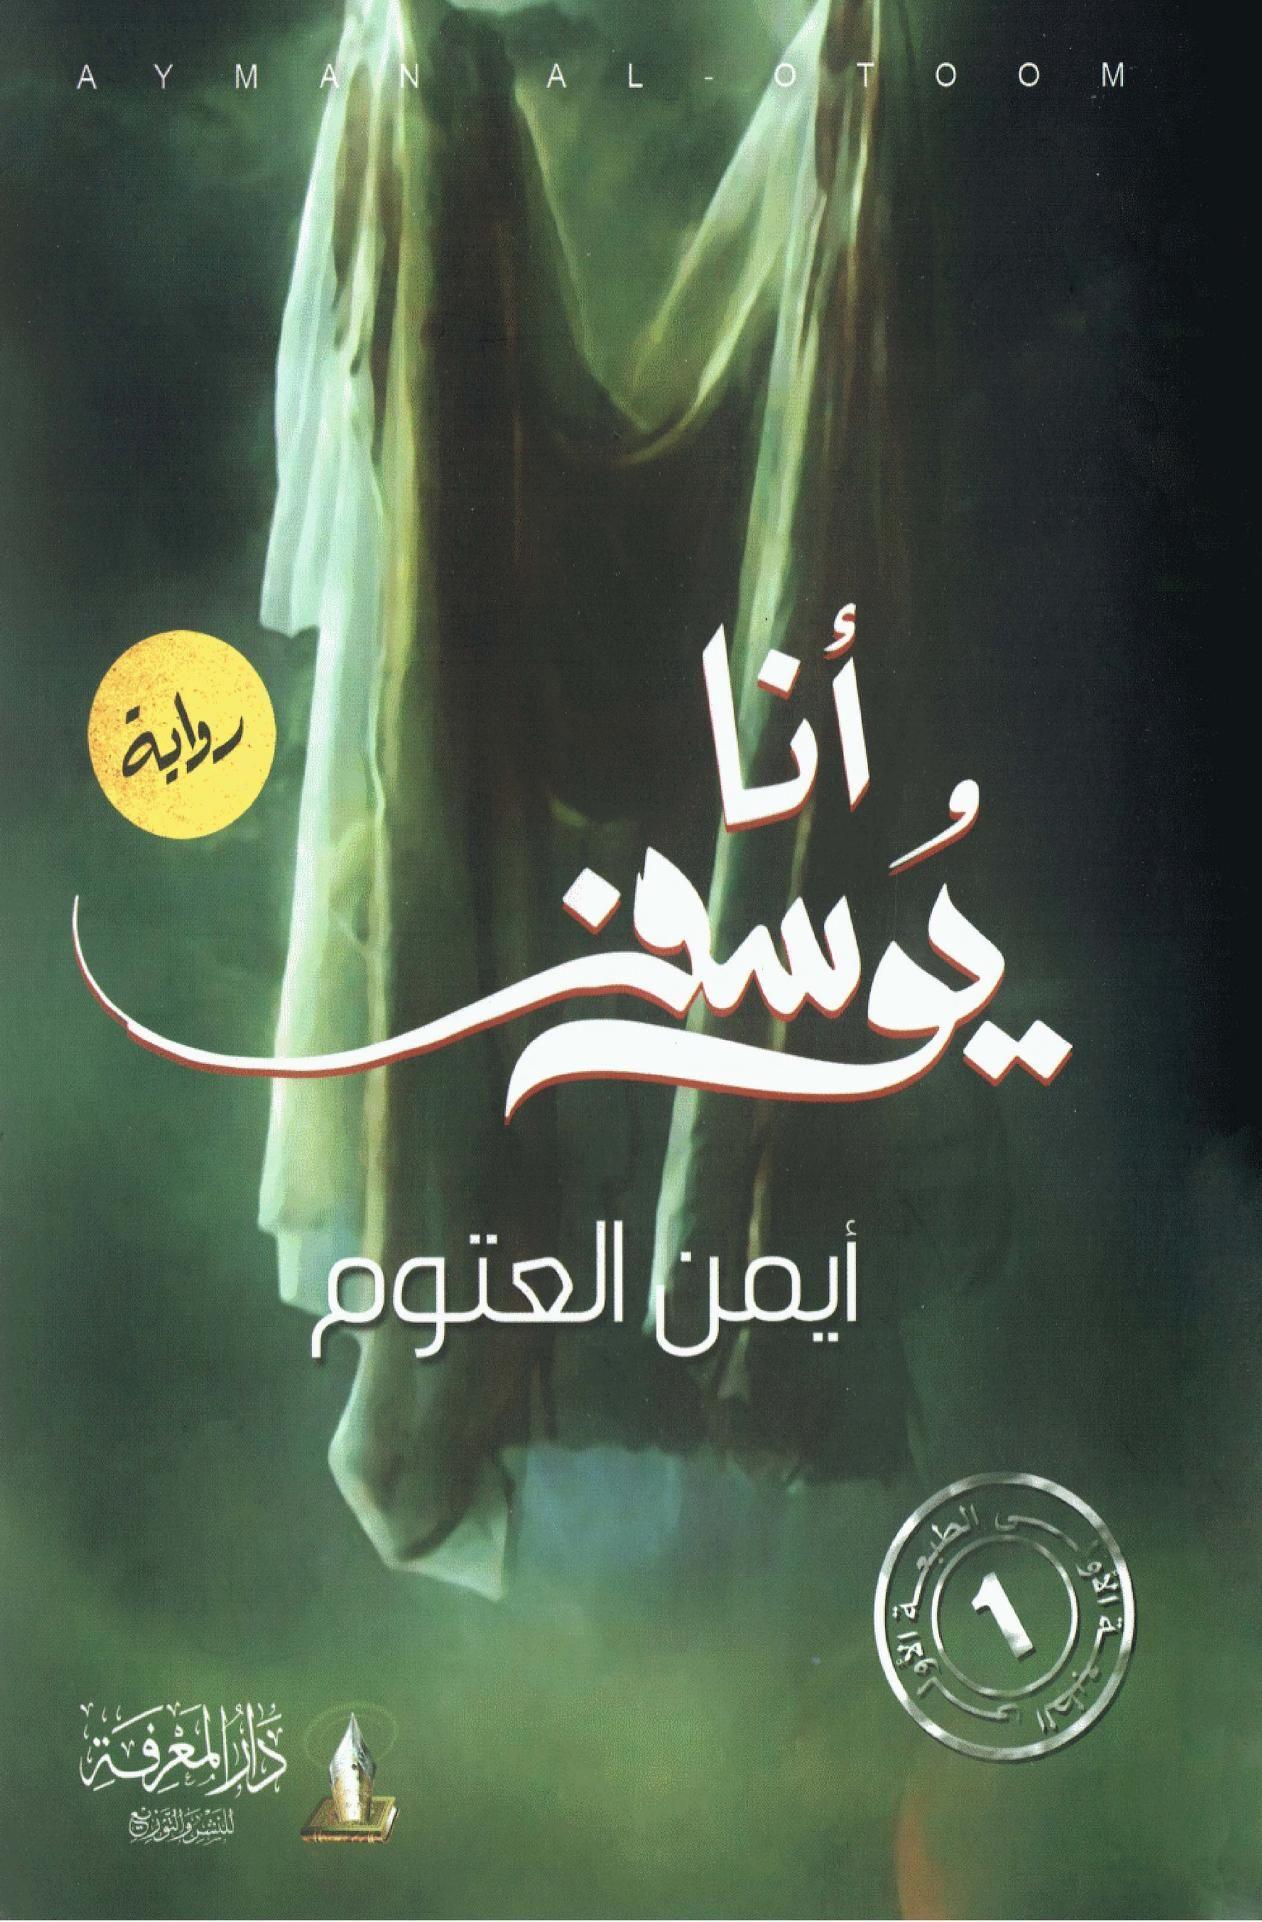 أنا يوسف رواية لـ أيمن العتوم Free Download Borrow And Streaming Internet Archive Ebooks Free Books Arabic Books Books You Should Read